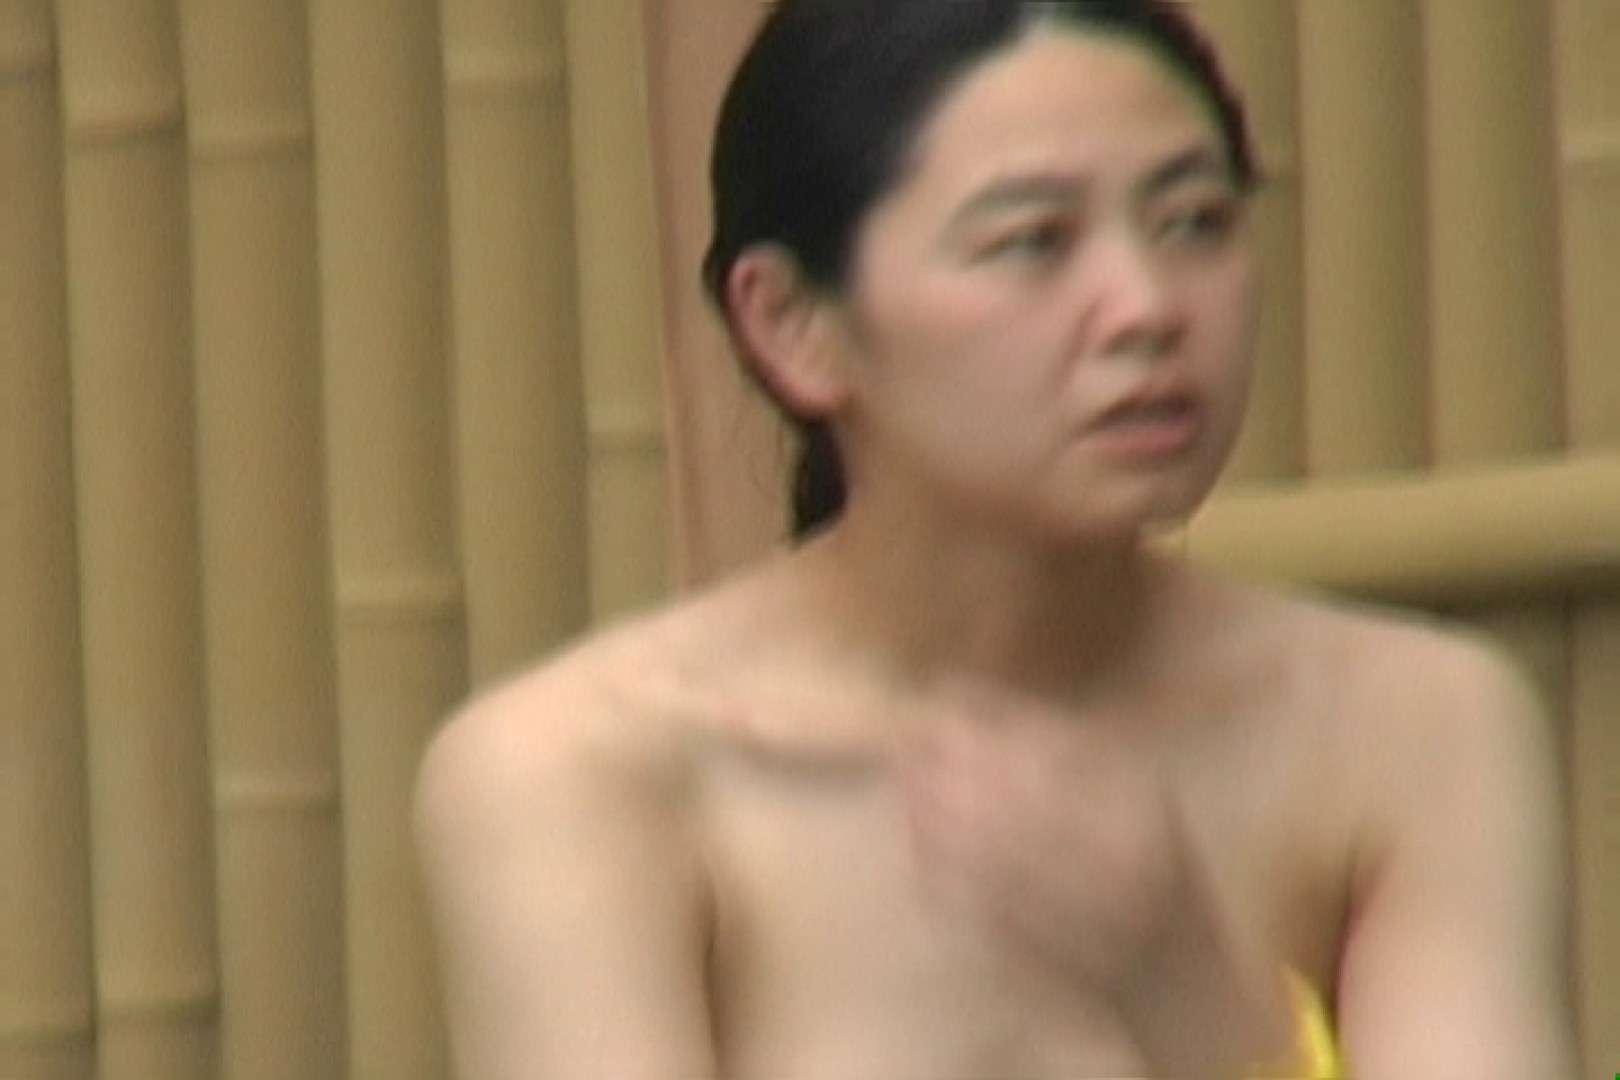 Aquaな露天風呂Vol.623 盗撮 SEX無修正画像 97画像 80